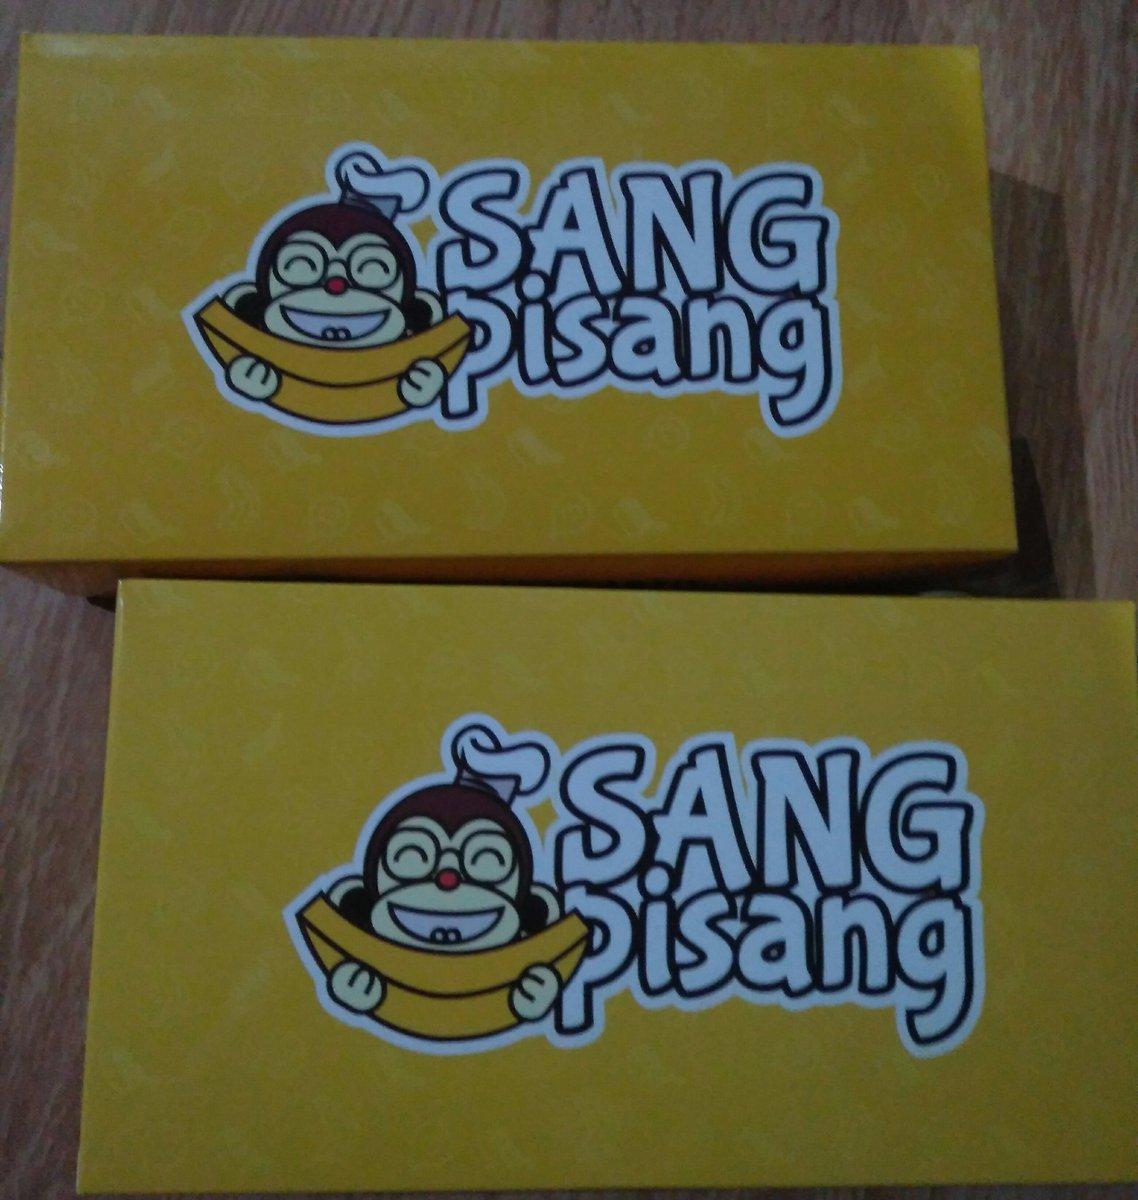 Beli krn kebetulan ongkirnya murah. Untuk rasanya anakku suka banget yg pisang nugget keju almondnya. Baru ini cobain banana rollnya, untuk rasanya yaa rasa pisang wkwkwkwk :D  Penasaran aja klo aku tag apa iya di RT yak... @kaesangp @SangPisang2017 https://t.co/tKvABil3a3